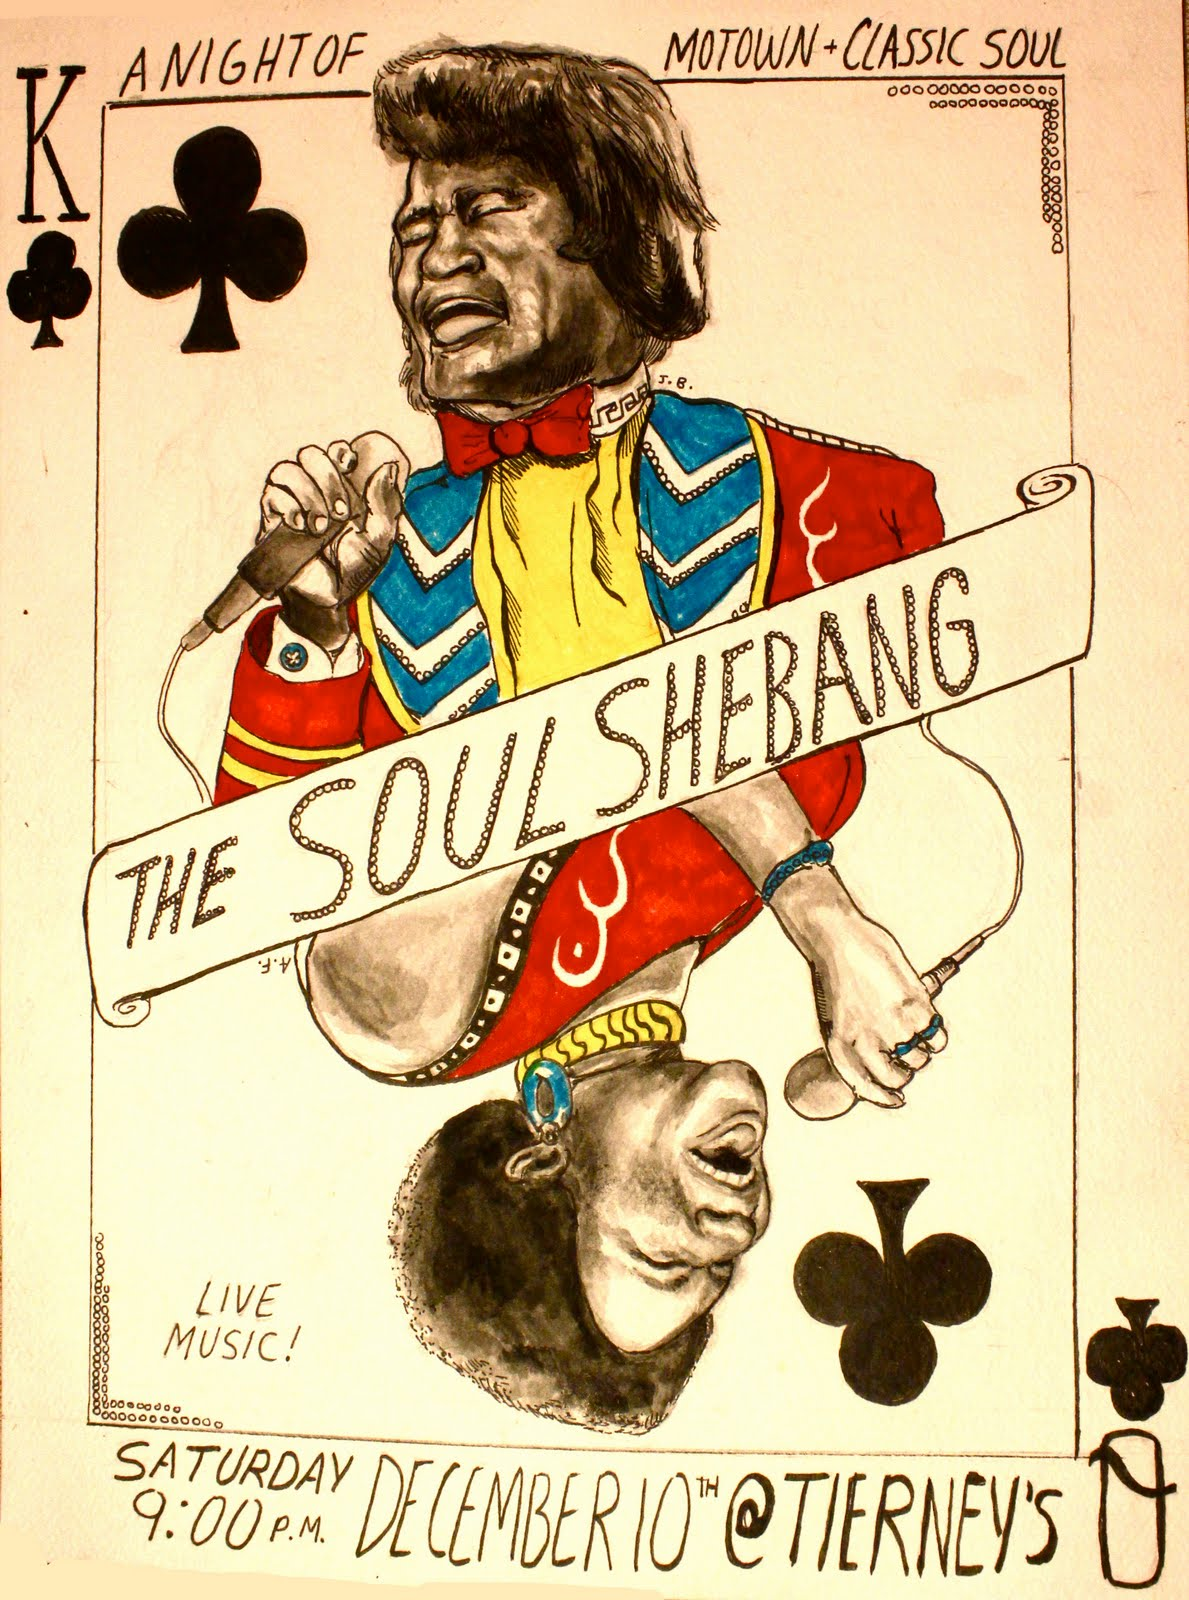 Drawn poster soul music Tavern Music Calendar:  Tierney's